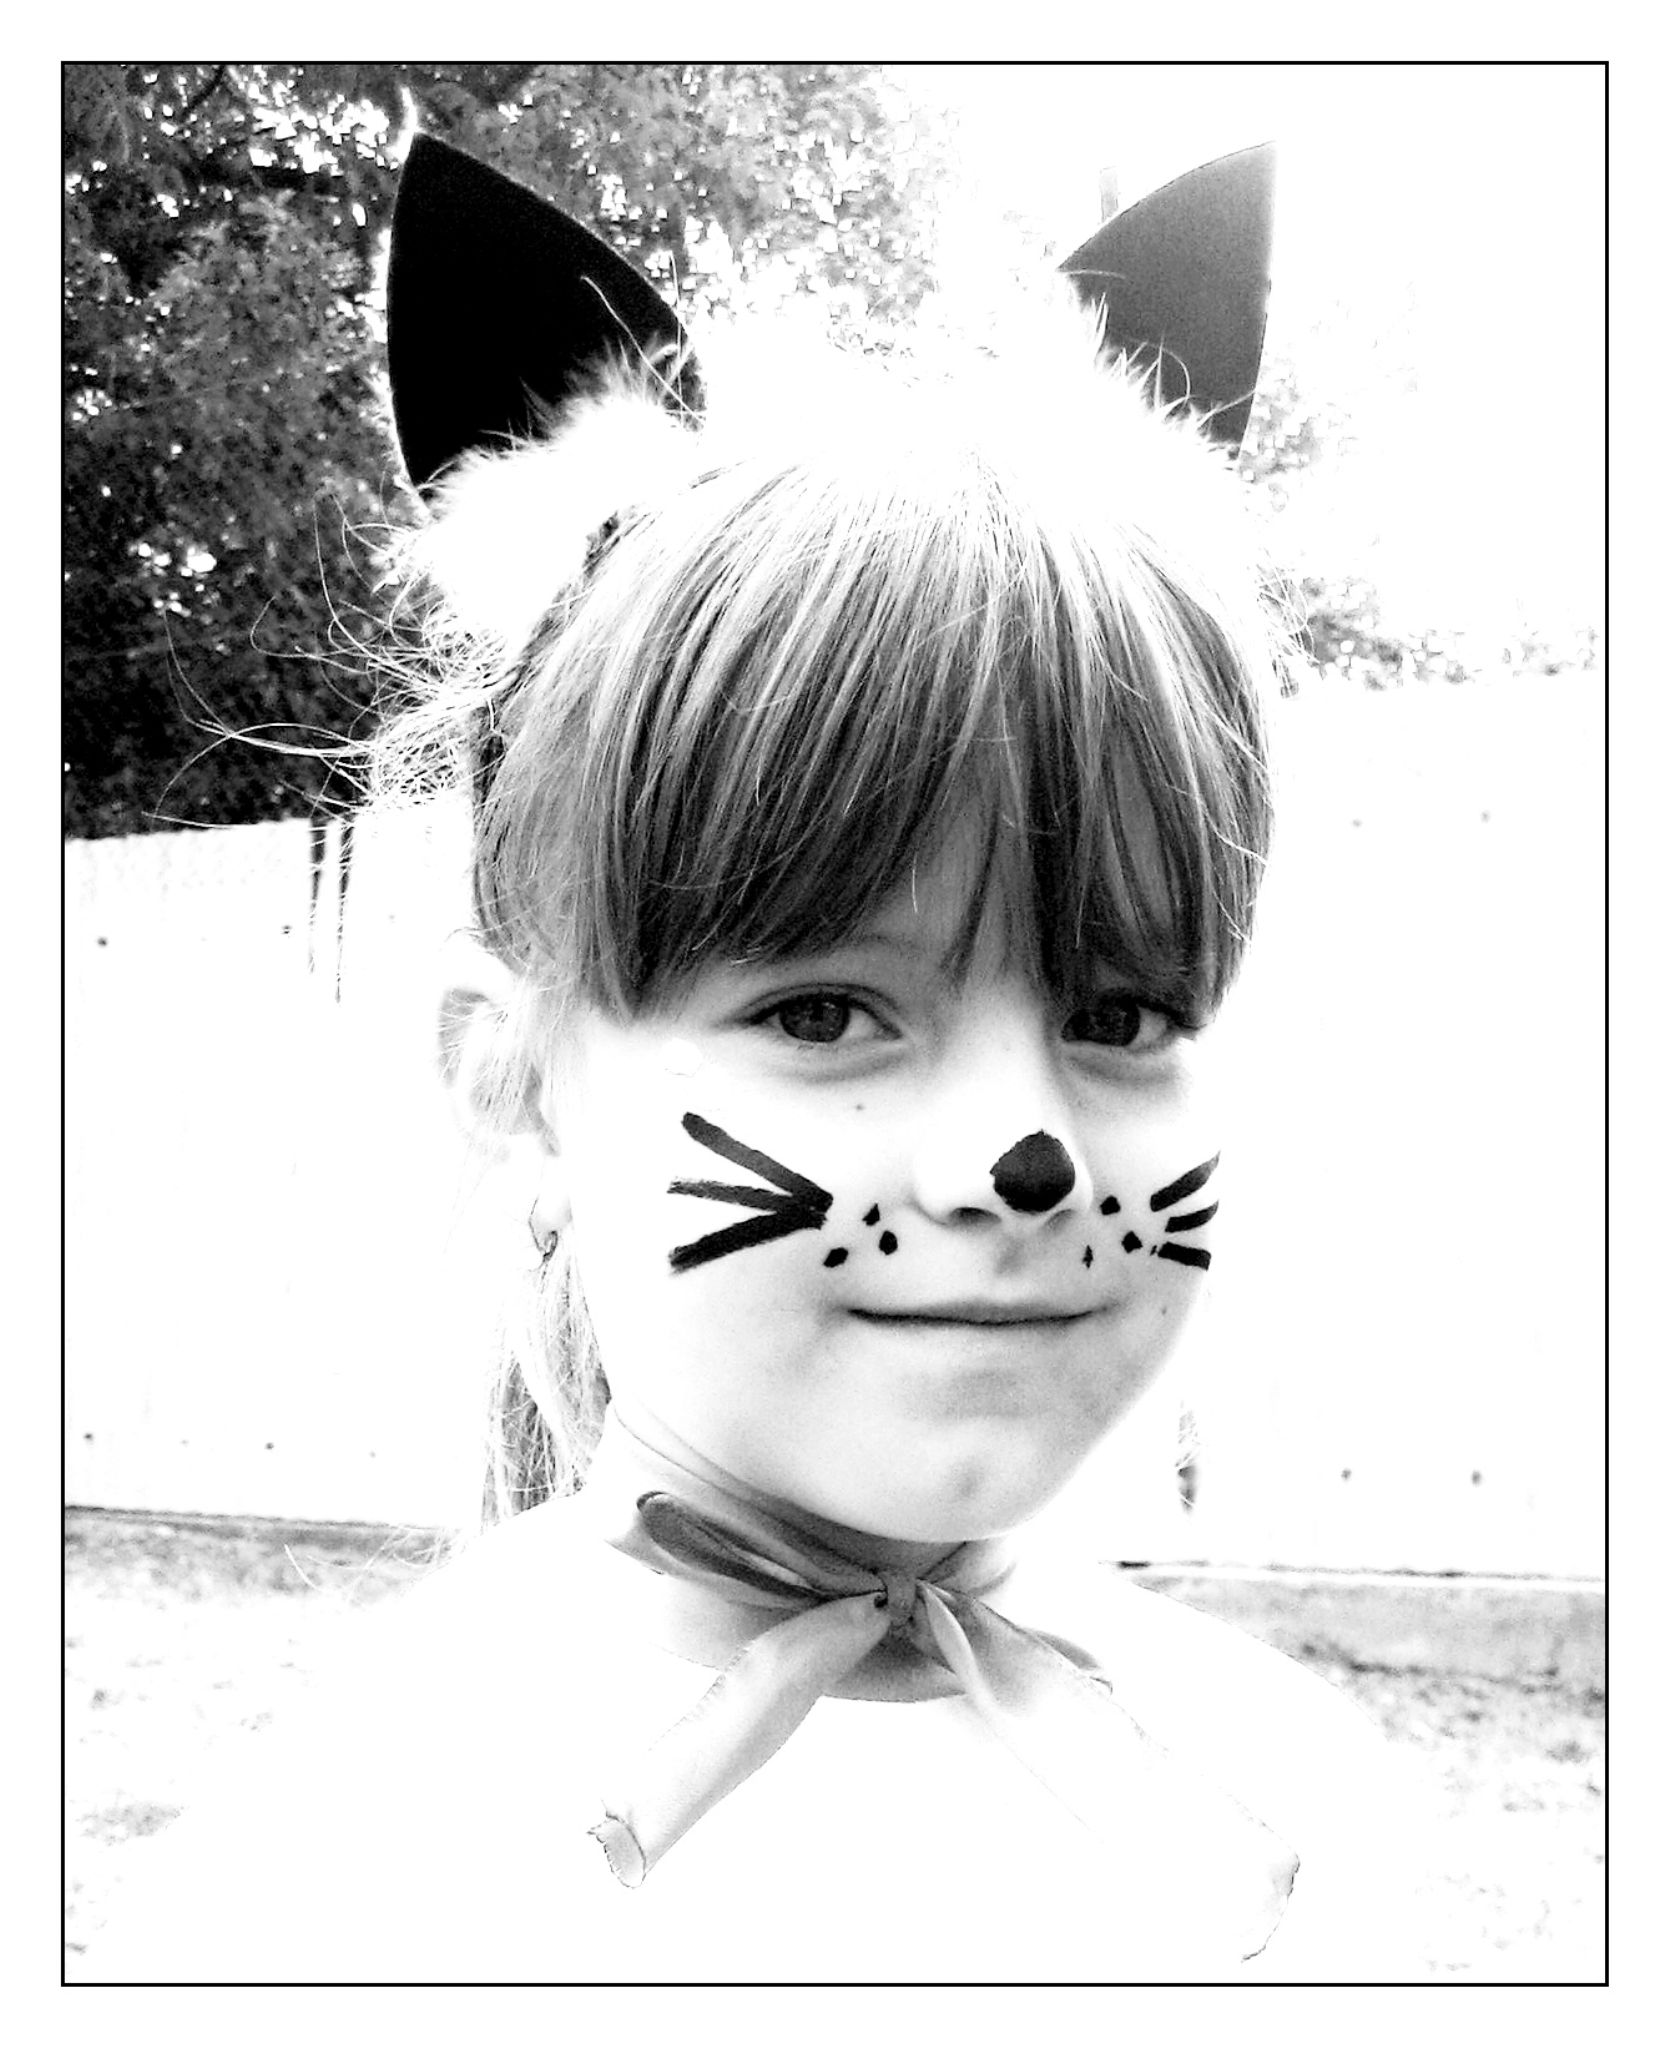 Dětský den Chvalčov, guláše 2014 341 by nejfoto